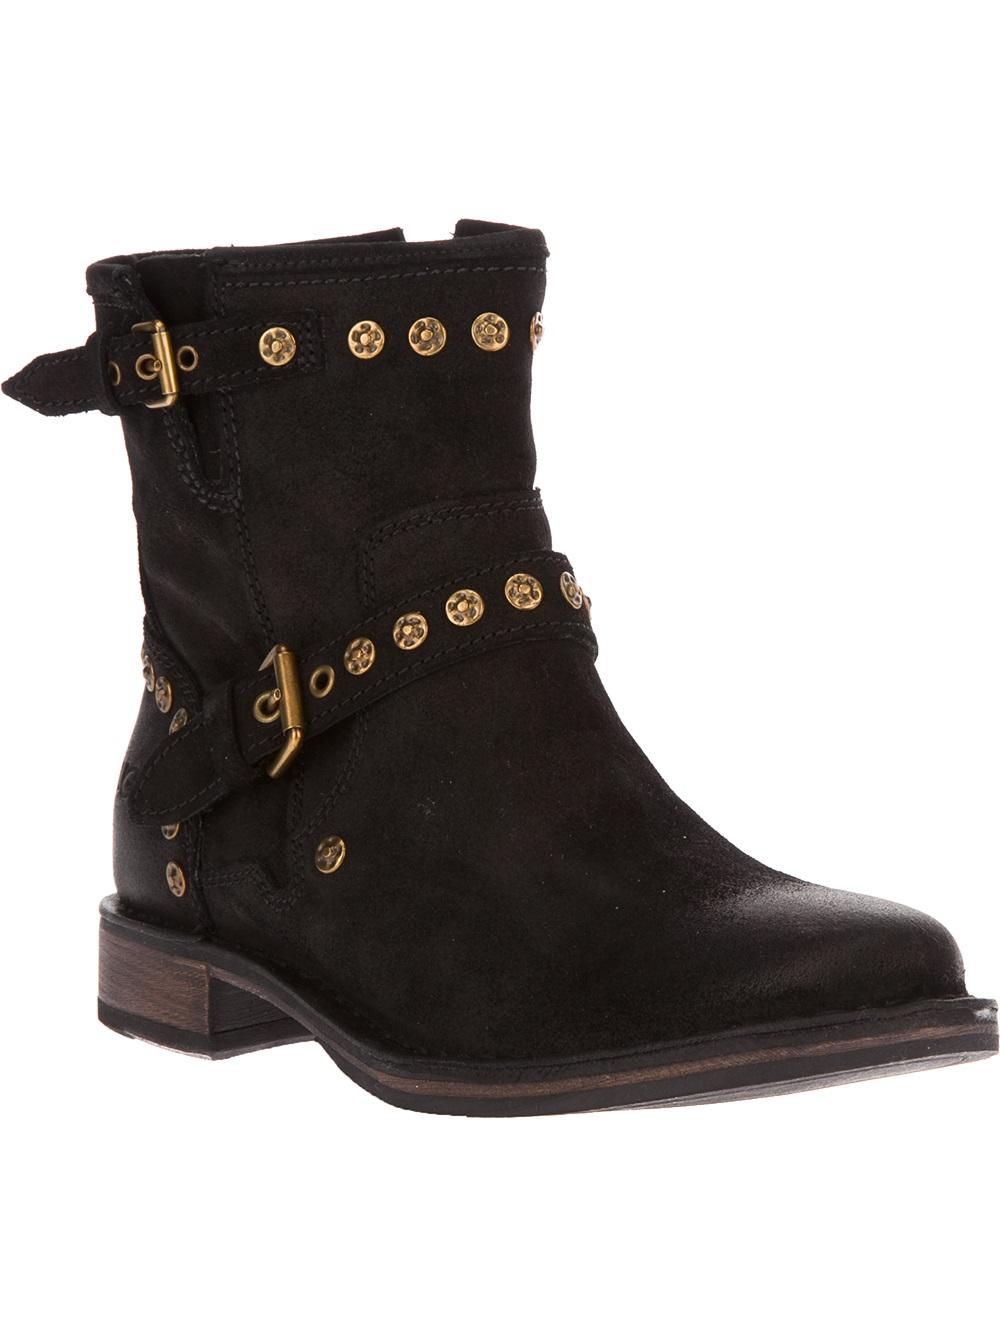 ugg fabrizia boot in black lyst